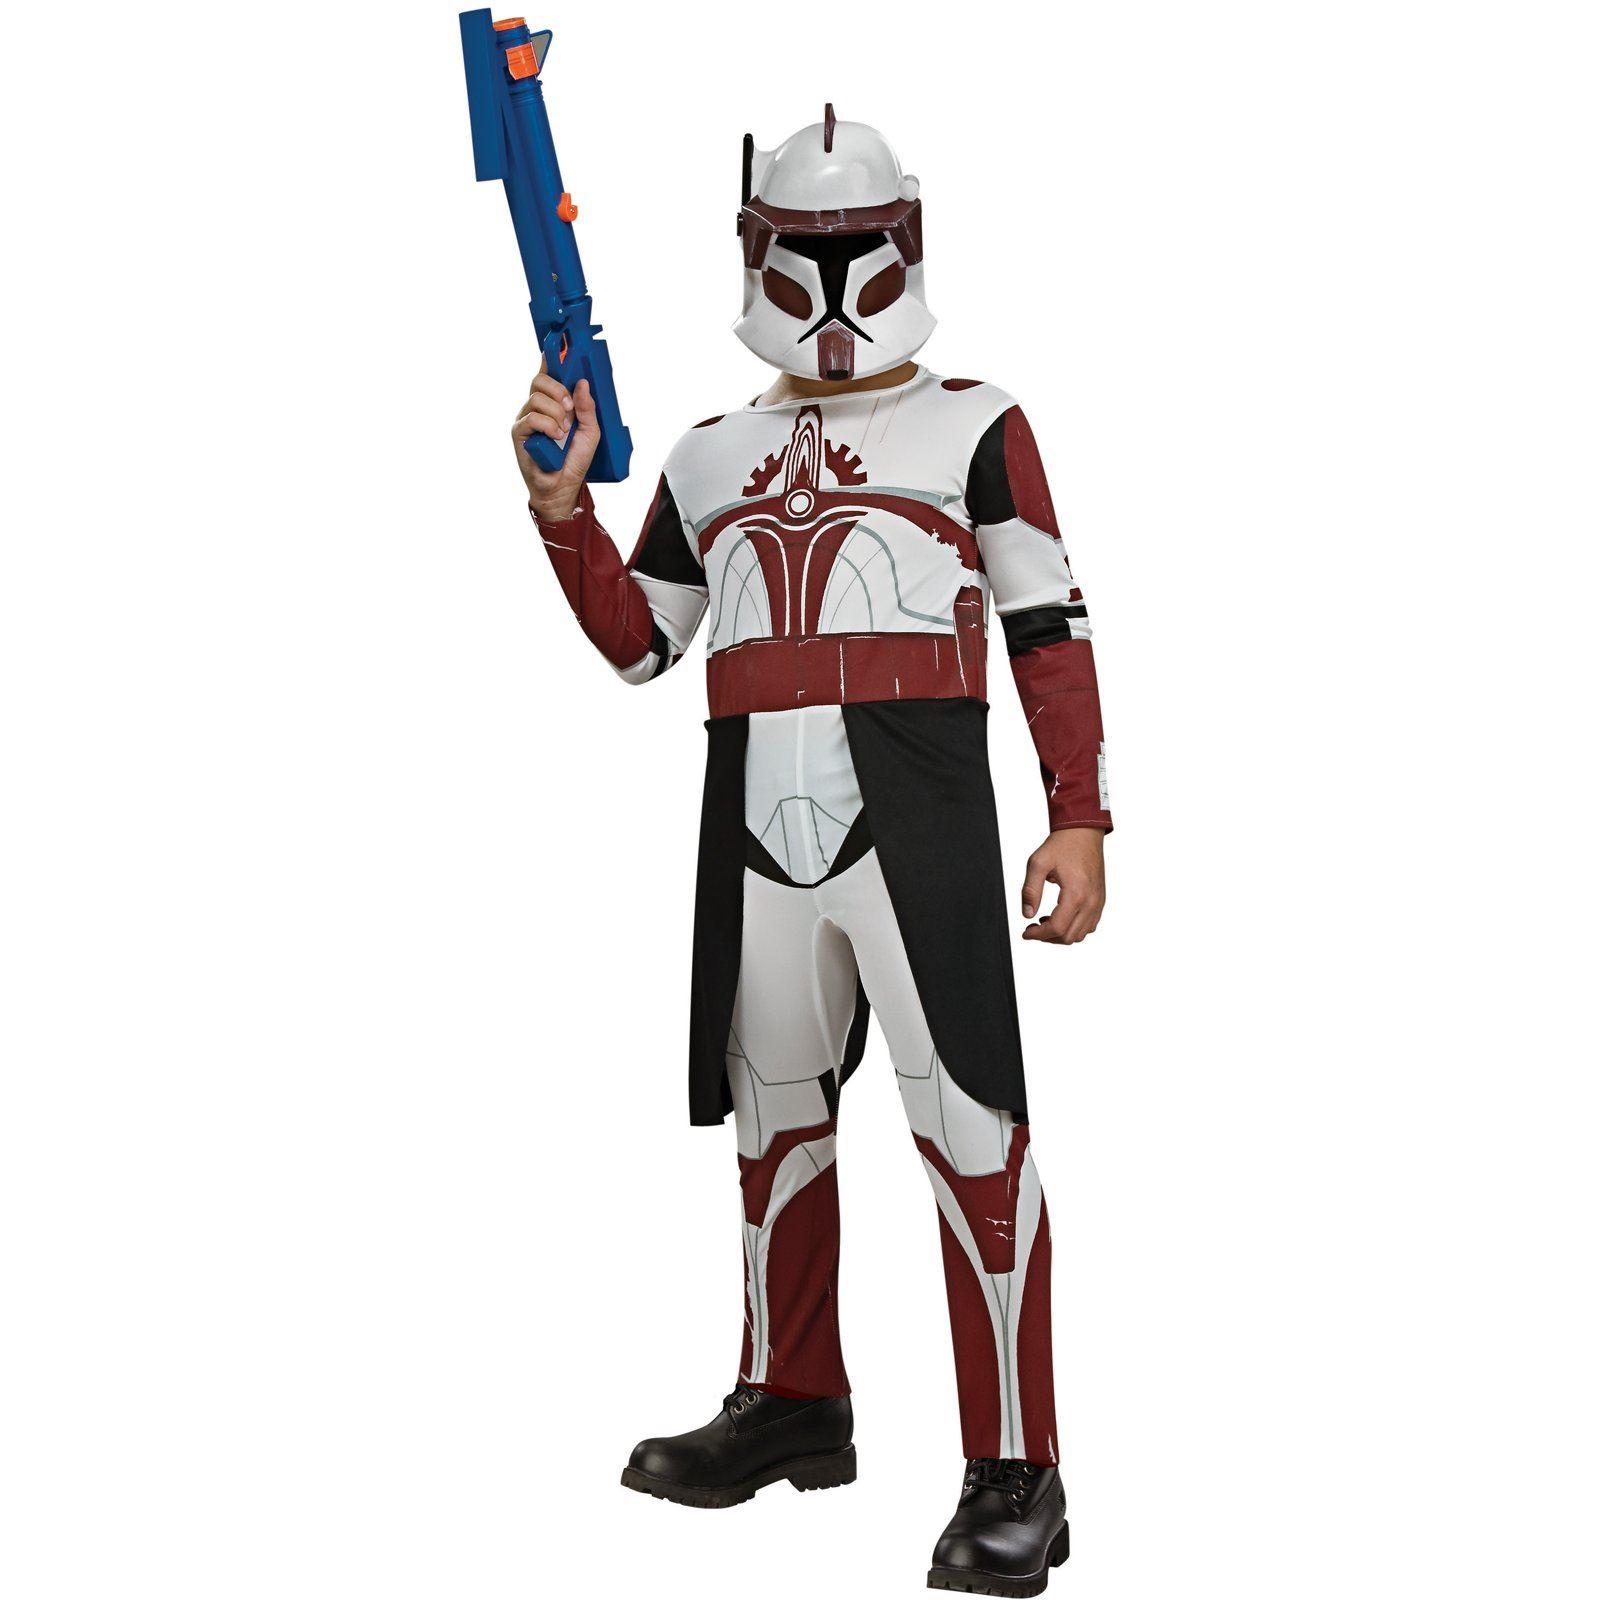 Kids Clone Trooper Boys Commander Costume  sc 1 st  The Costume Land & Kids Clone Trooper Boys Commander Costume | $27.99 | The Costume Land